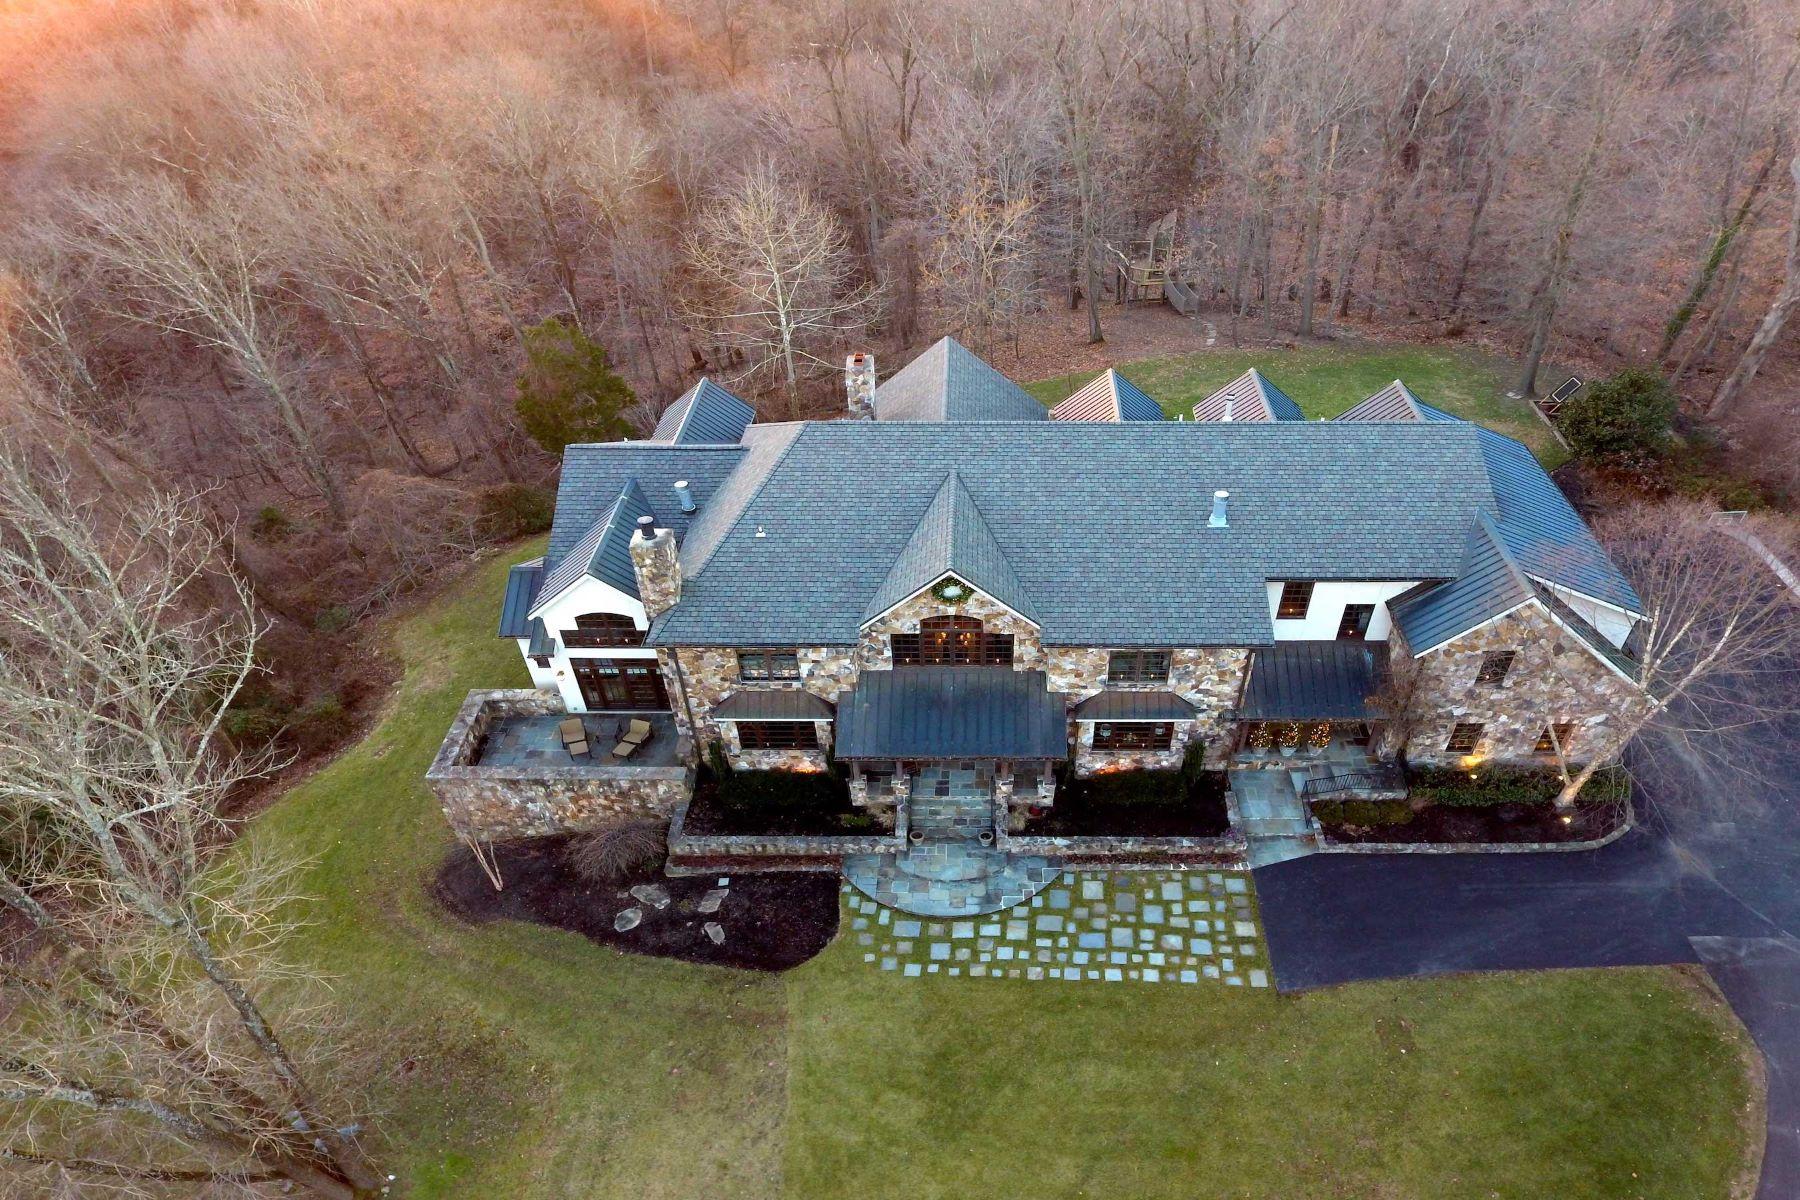 single family homes for Active at Falls Road Corridor 6138 Falls Road Towson, Maryland 21209 United States